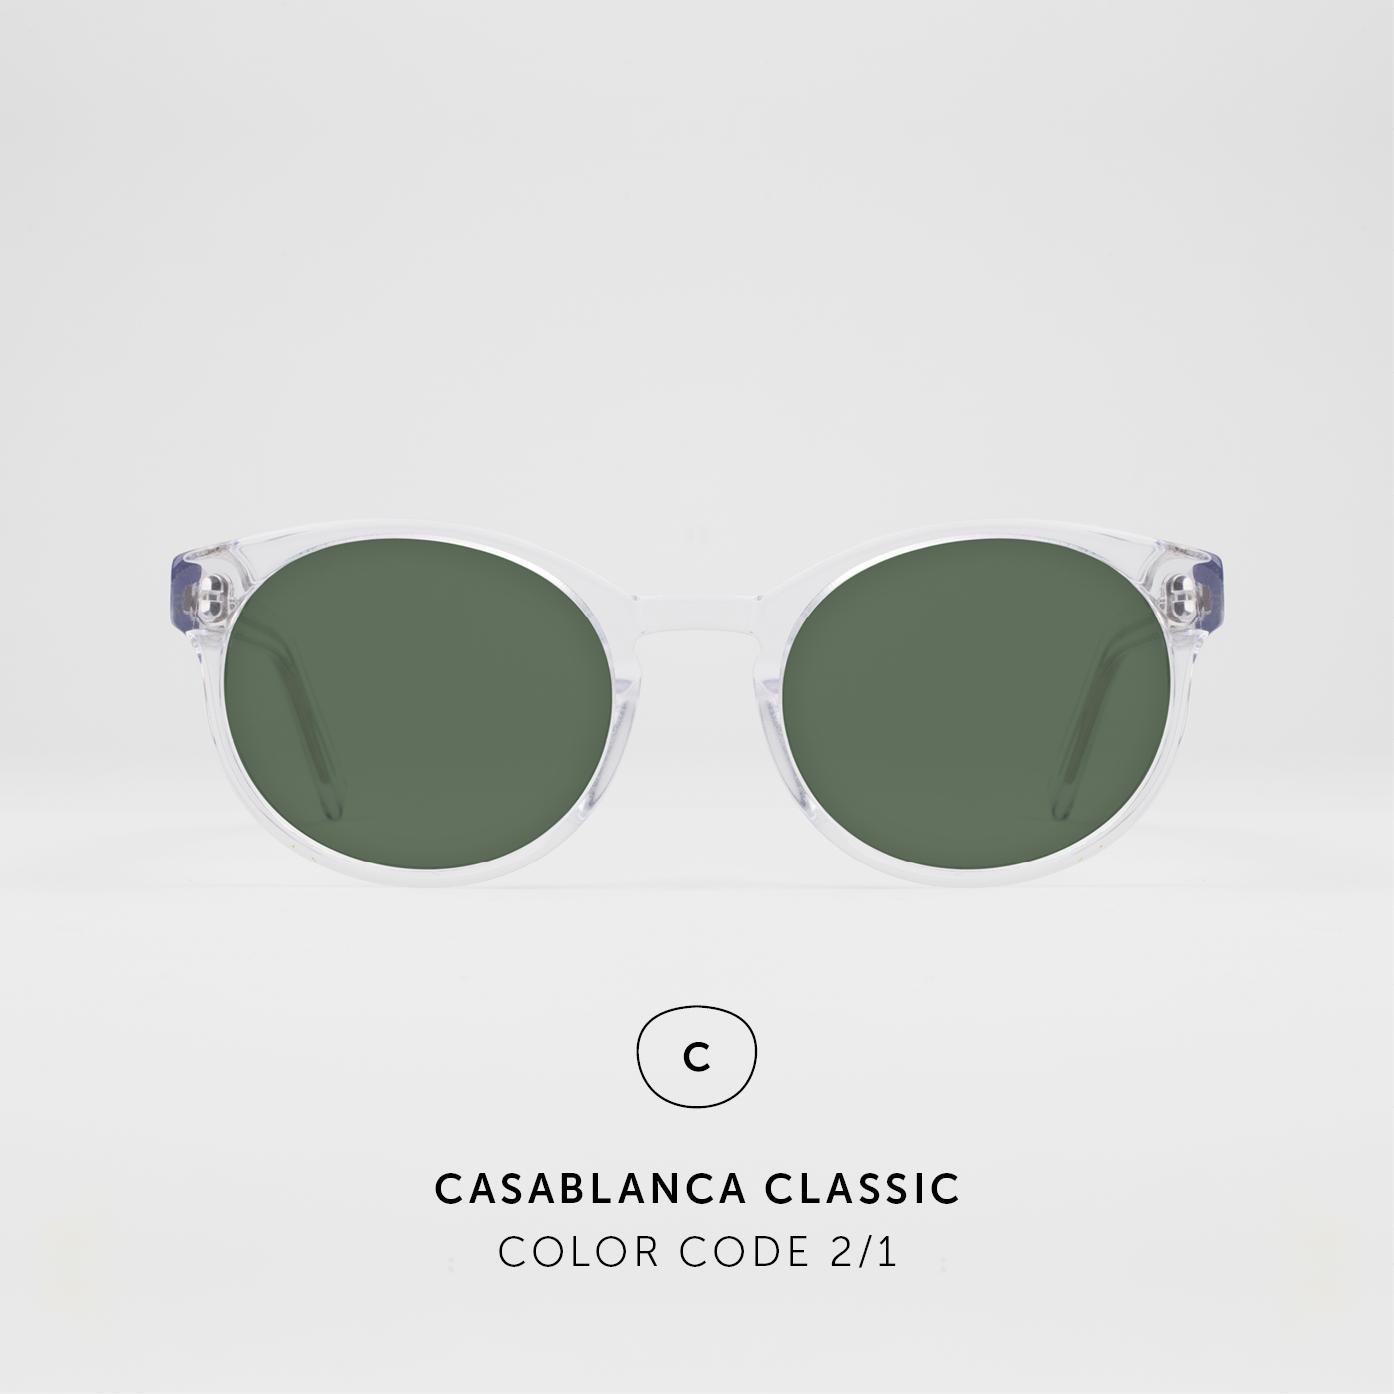 CasablancaClassic16.jpg